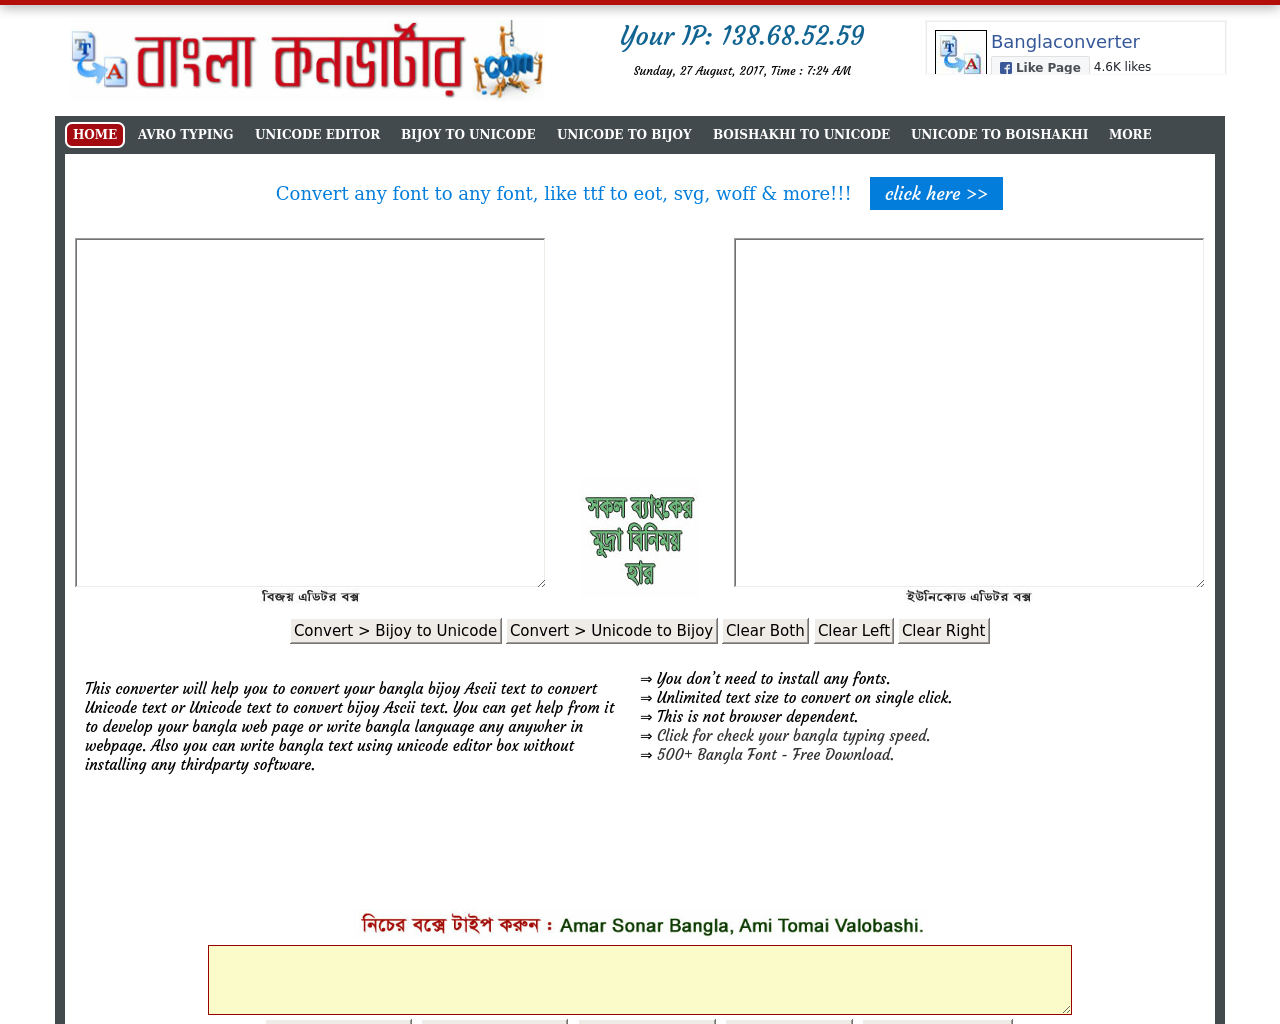 Bangla-Converter-Advertising-Reviews-Pricing